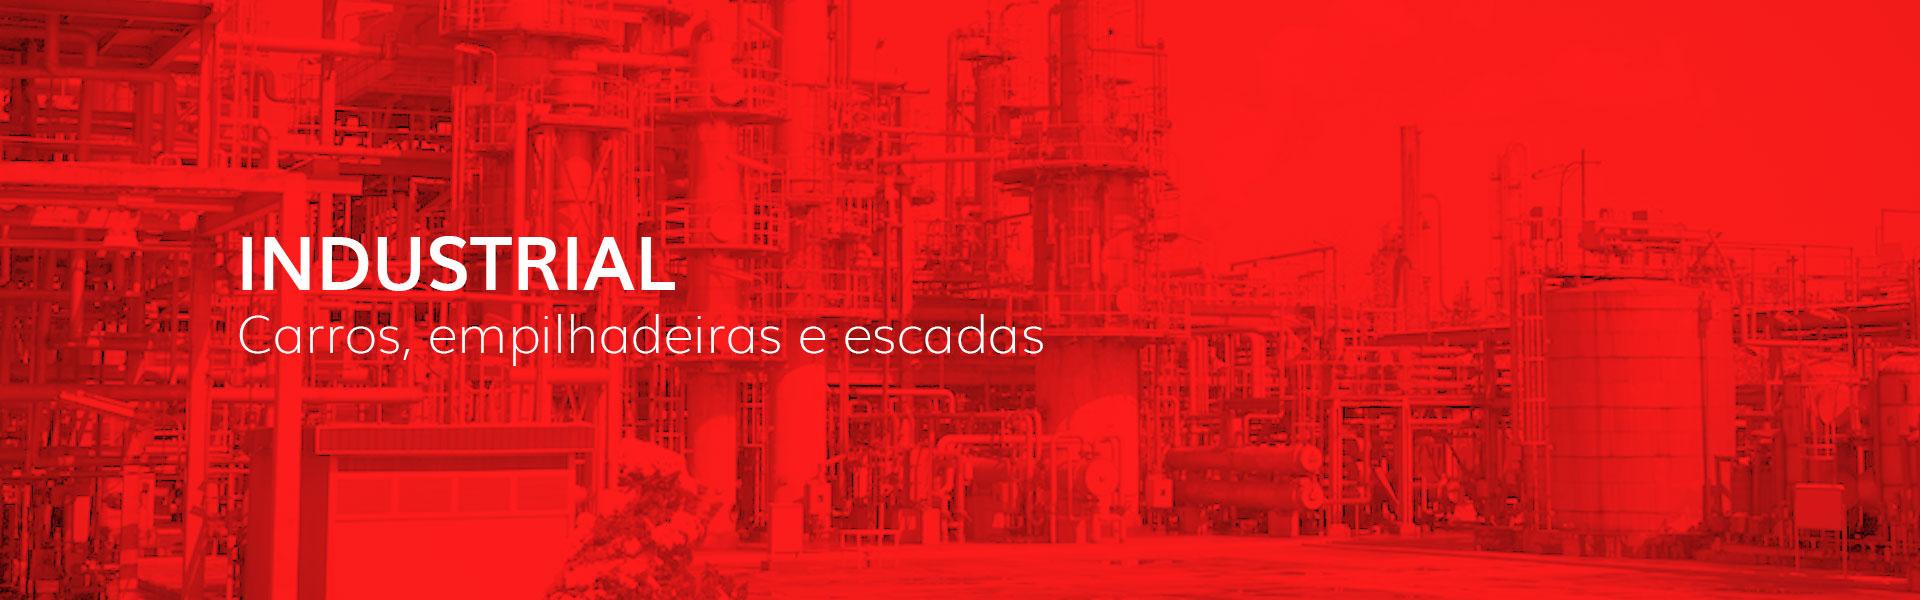 Banner Industrial